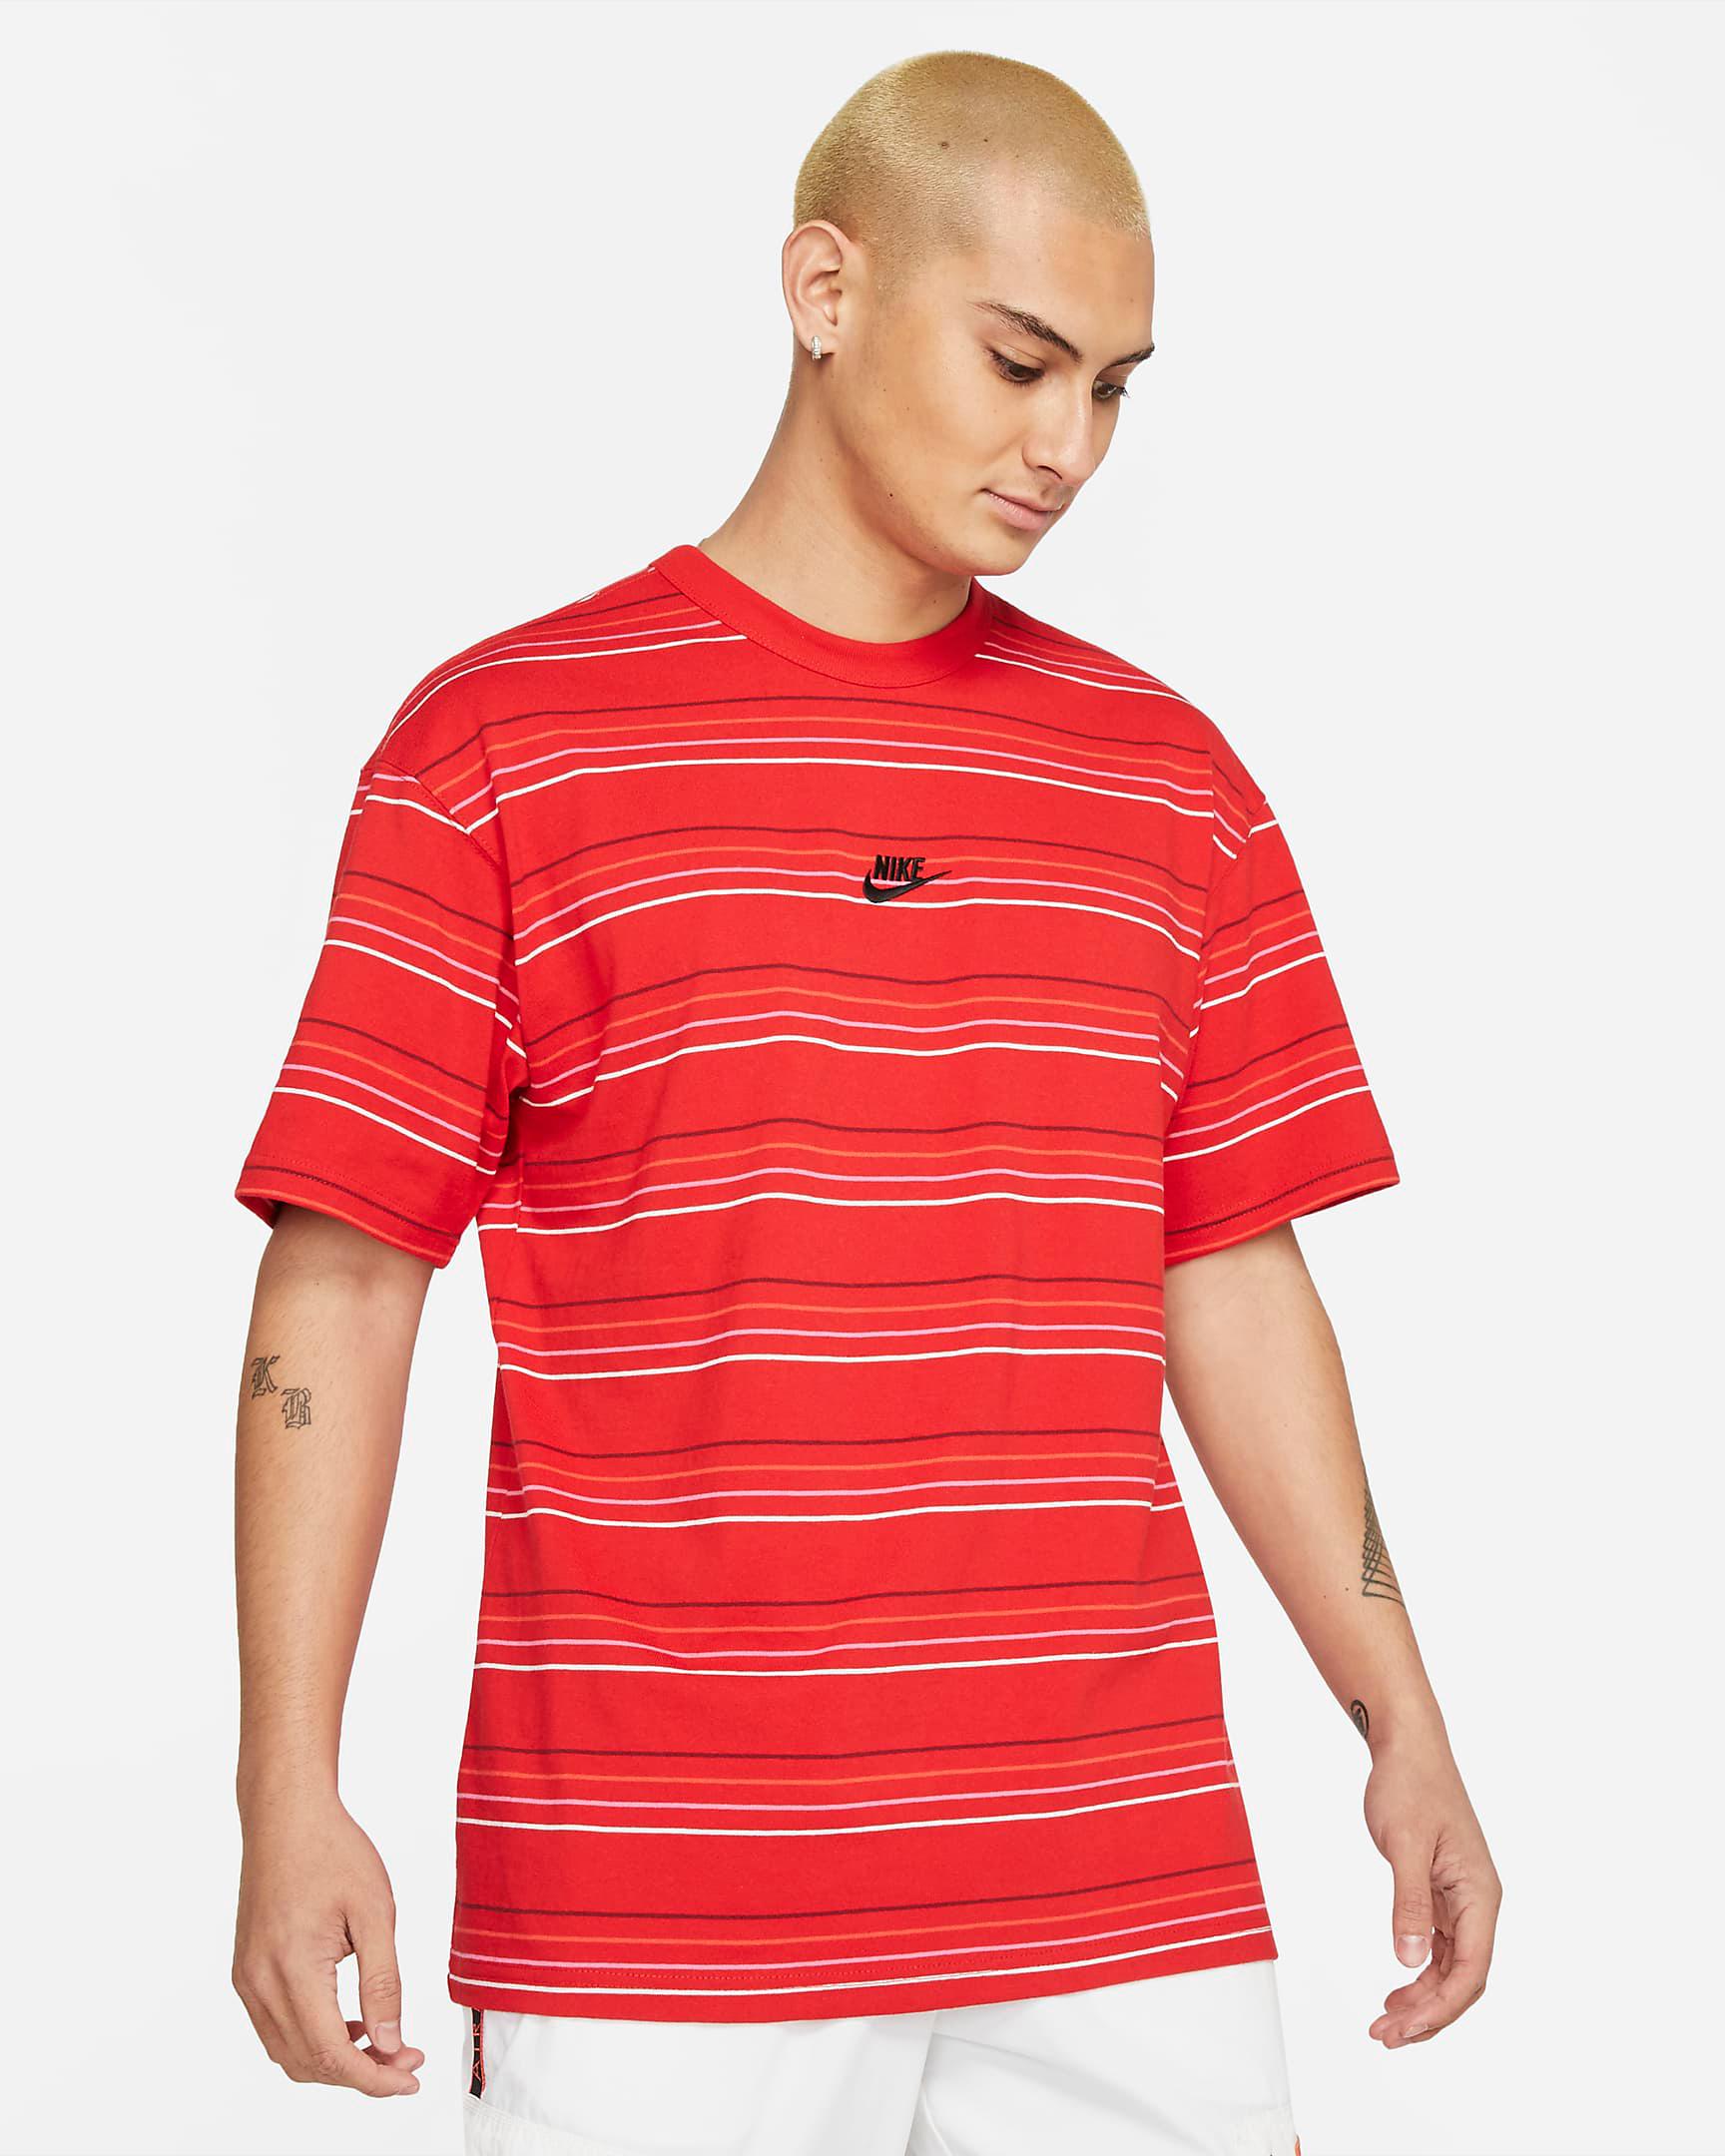 nike-sportswear-red-striped-shirt